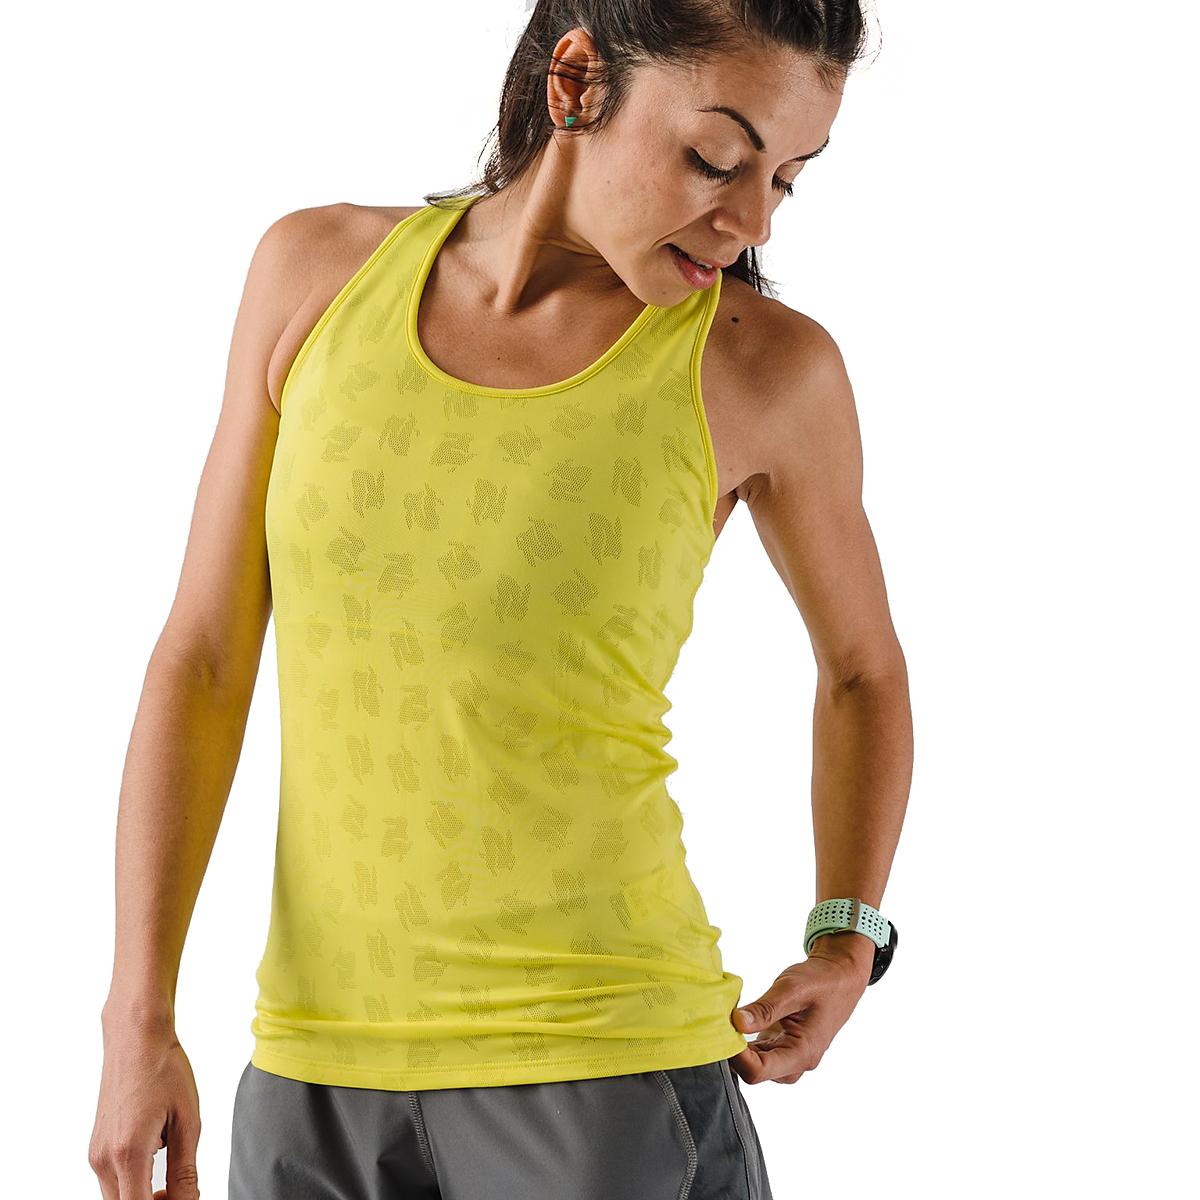 Women's Rabbit Bunny Hop Support & Pocket Tank - Color: Lemon Tonic - Size: XS, Lemon Tonic, large, image 3